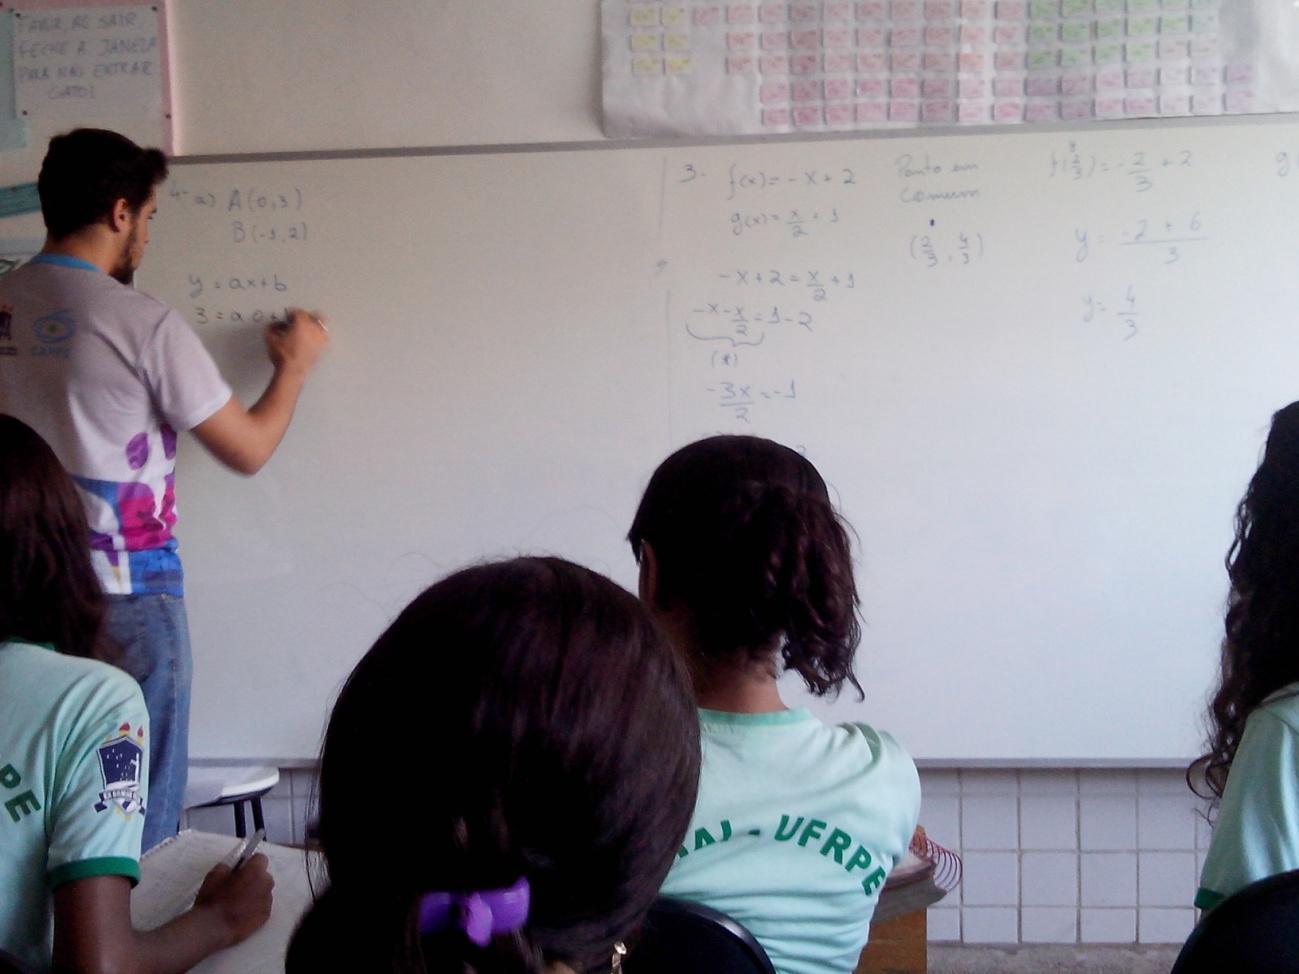 C:\Users\Angela\Dropbox\PIBID_Matemática_ID\IDs\Evandro\Produções\Reforço\Fotos\IMG_20150512_140039.jpg